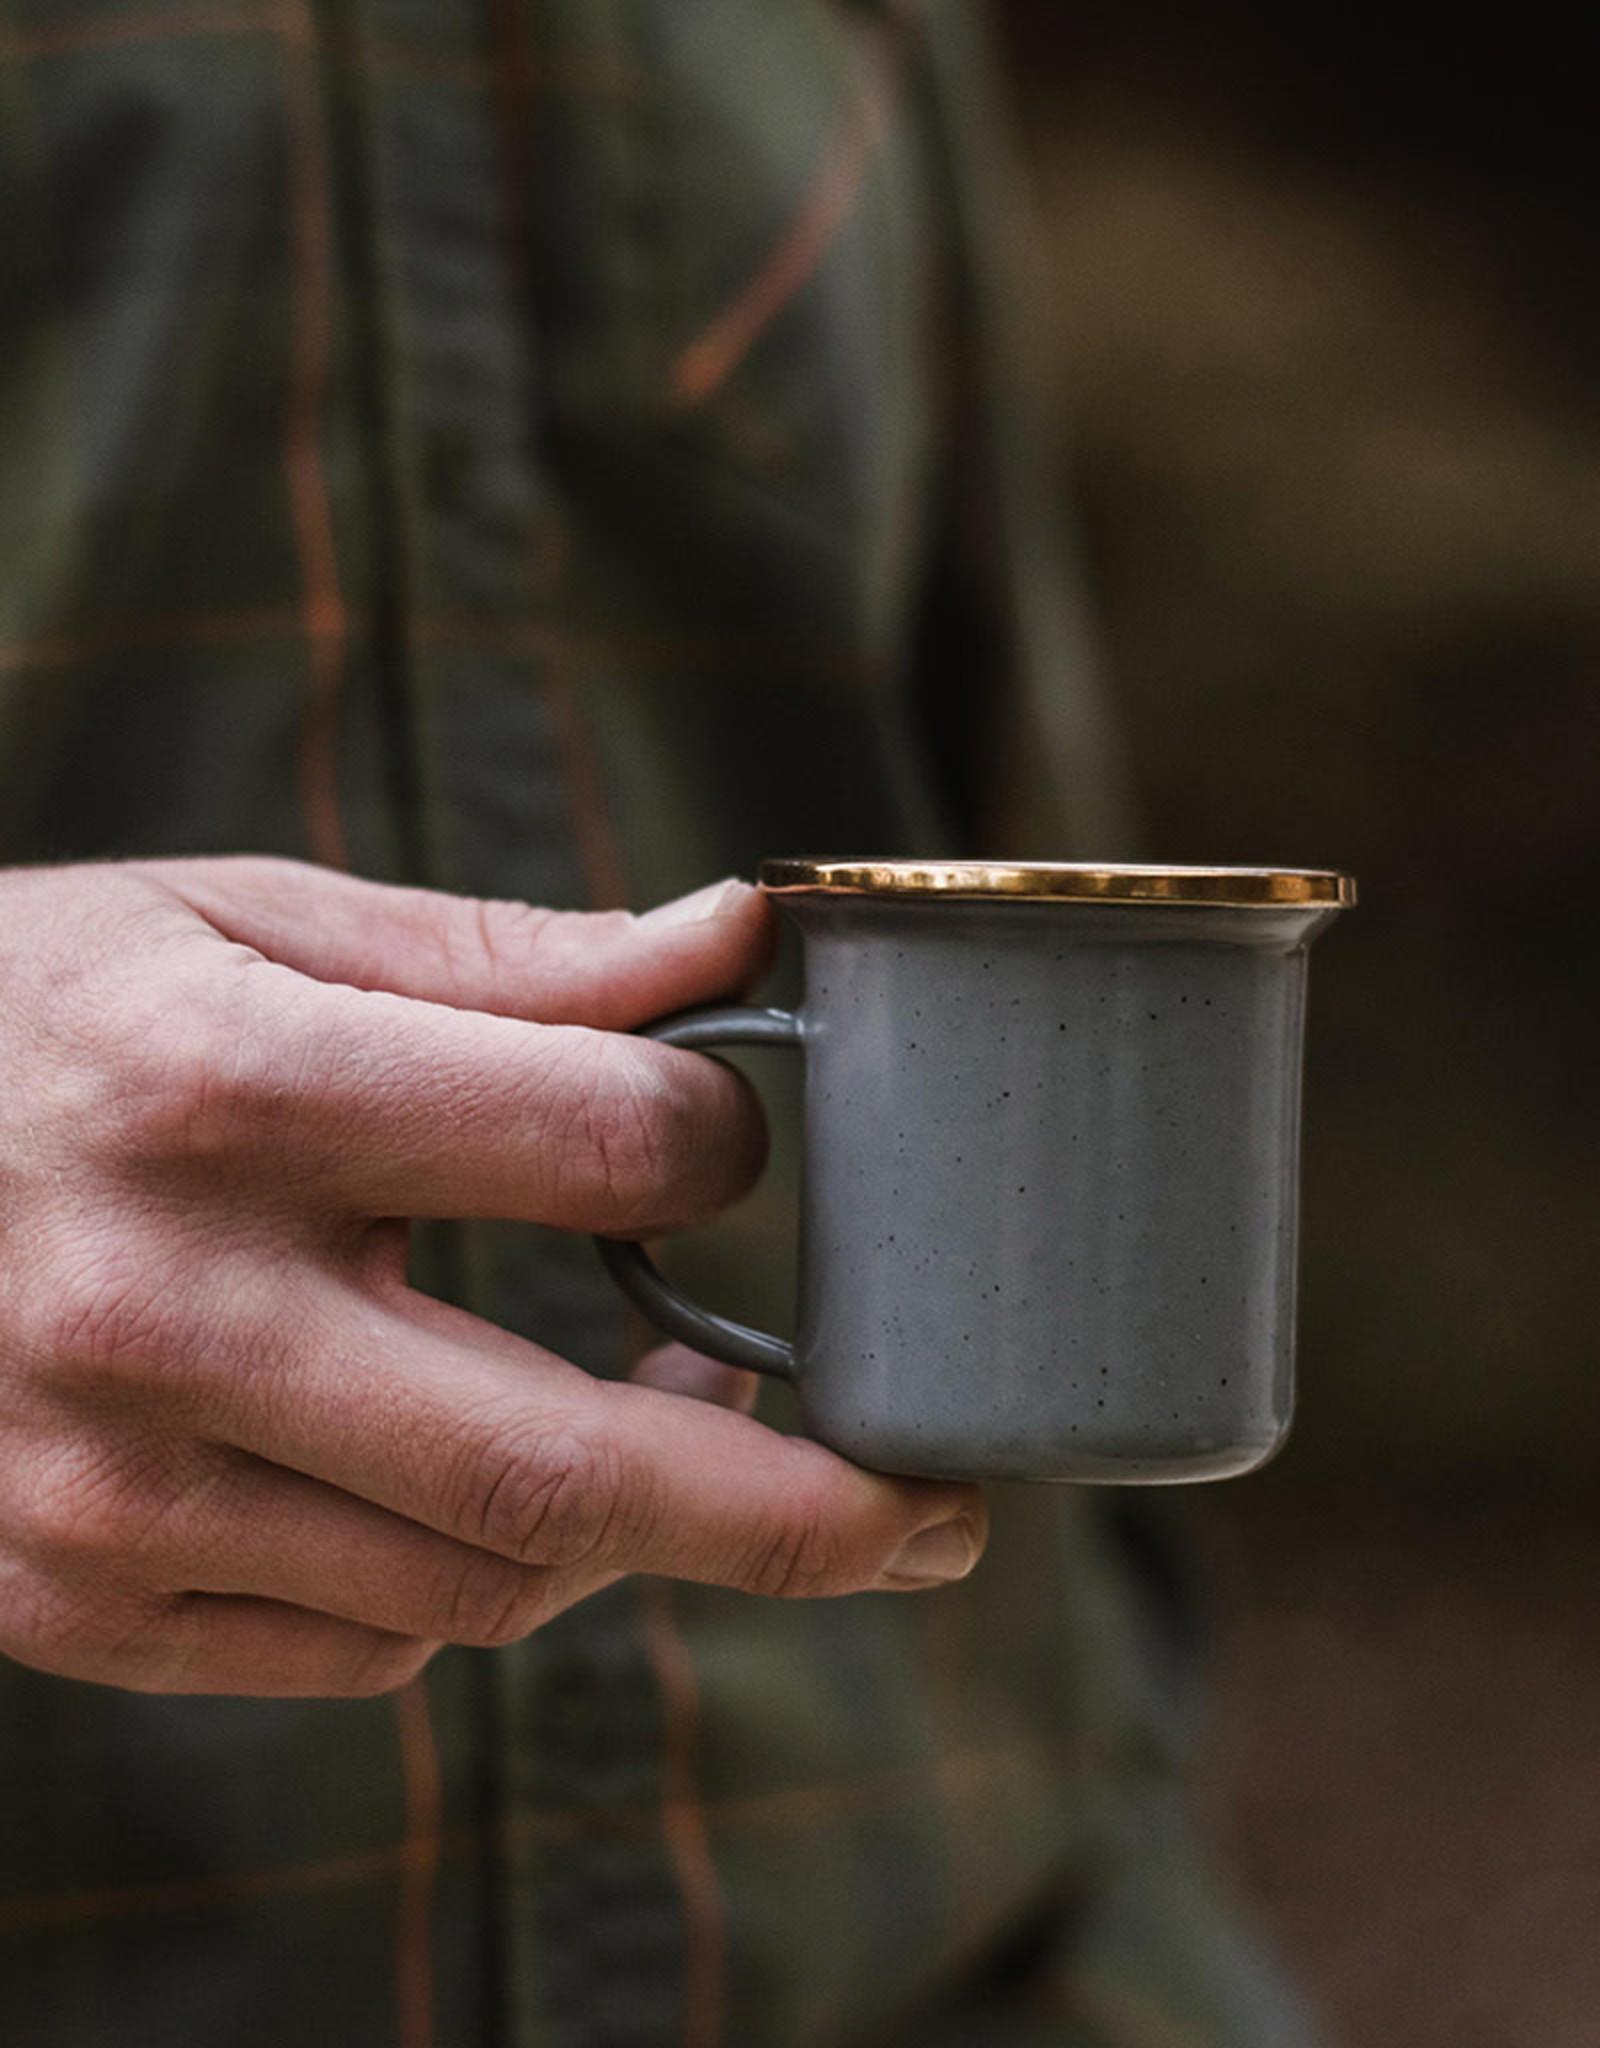 Barebones Barebones - Home - Enamel Espresso Cups (set of 2)